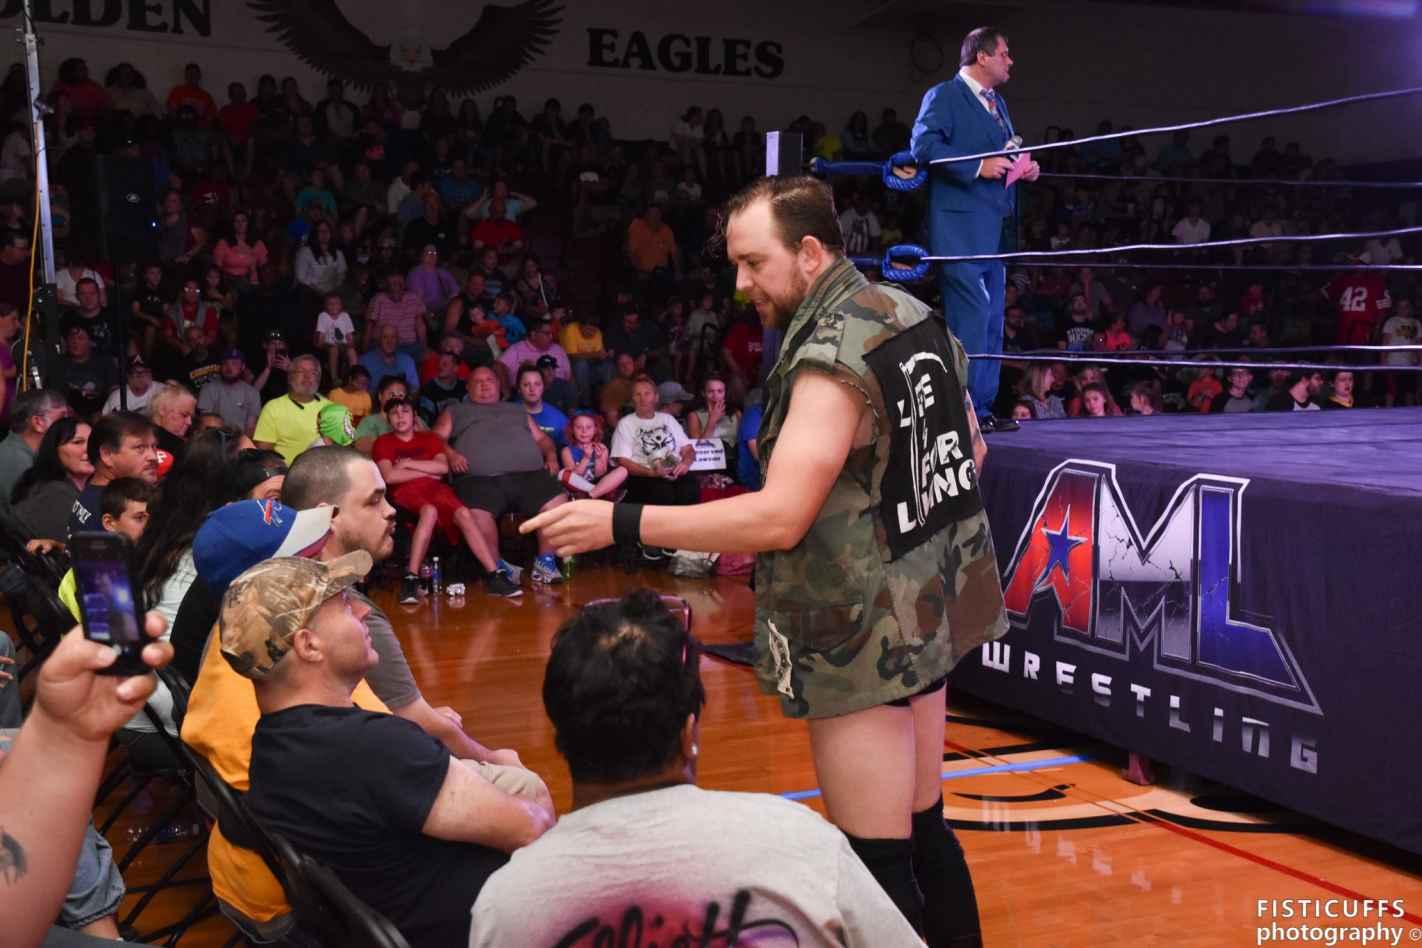 Billy Brash Taunt The AML Wrestling Crowd